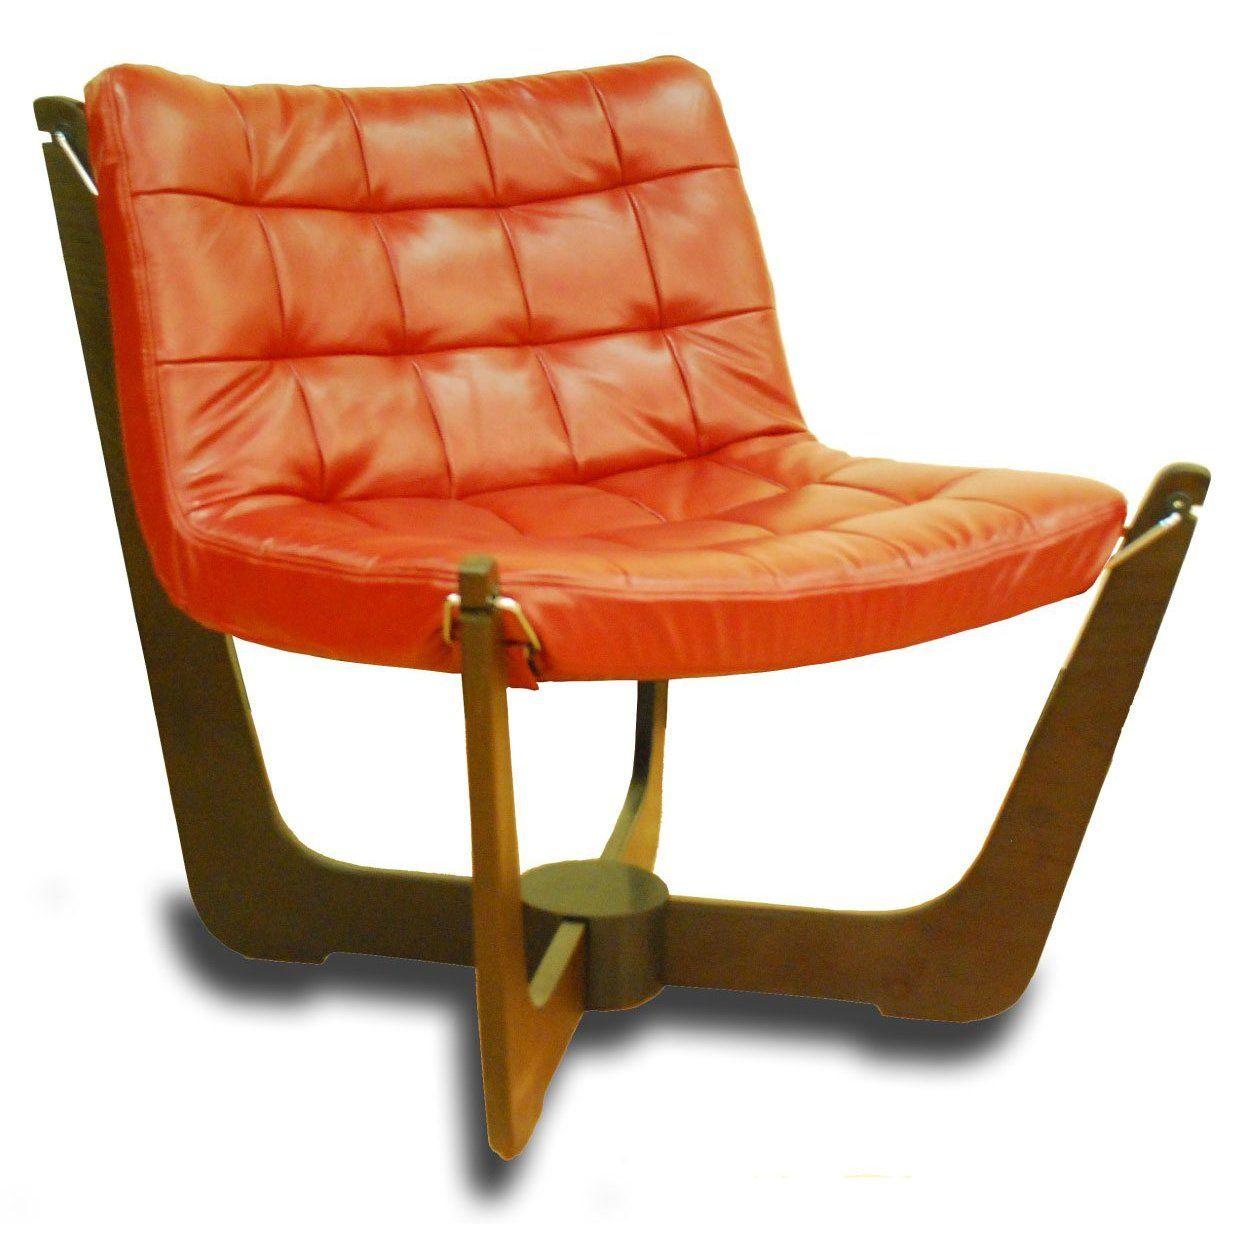 ergonomic chair norway hanging groupon norwegian scandinavian lounge vanity side furniture genuine leather